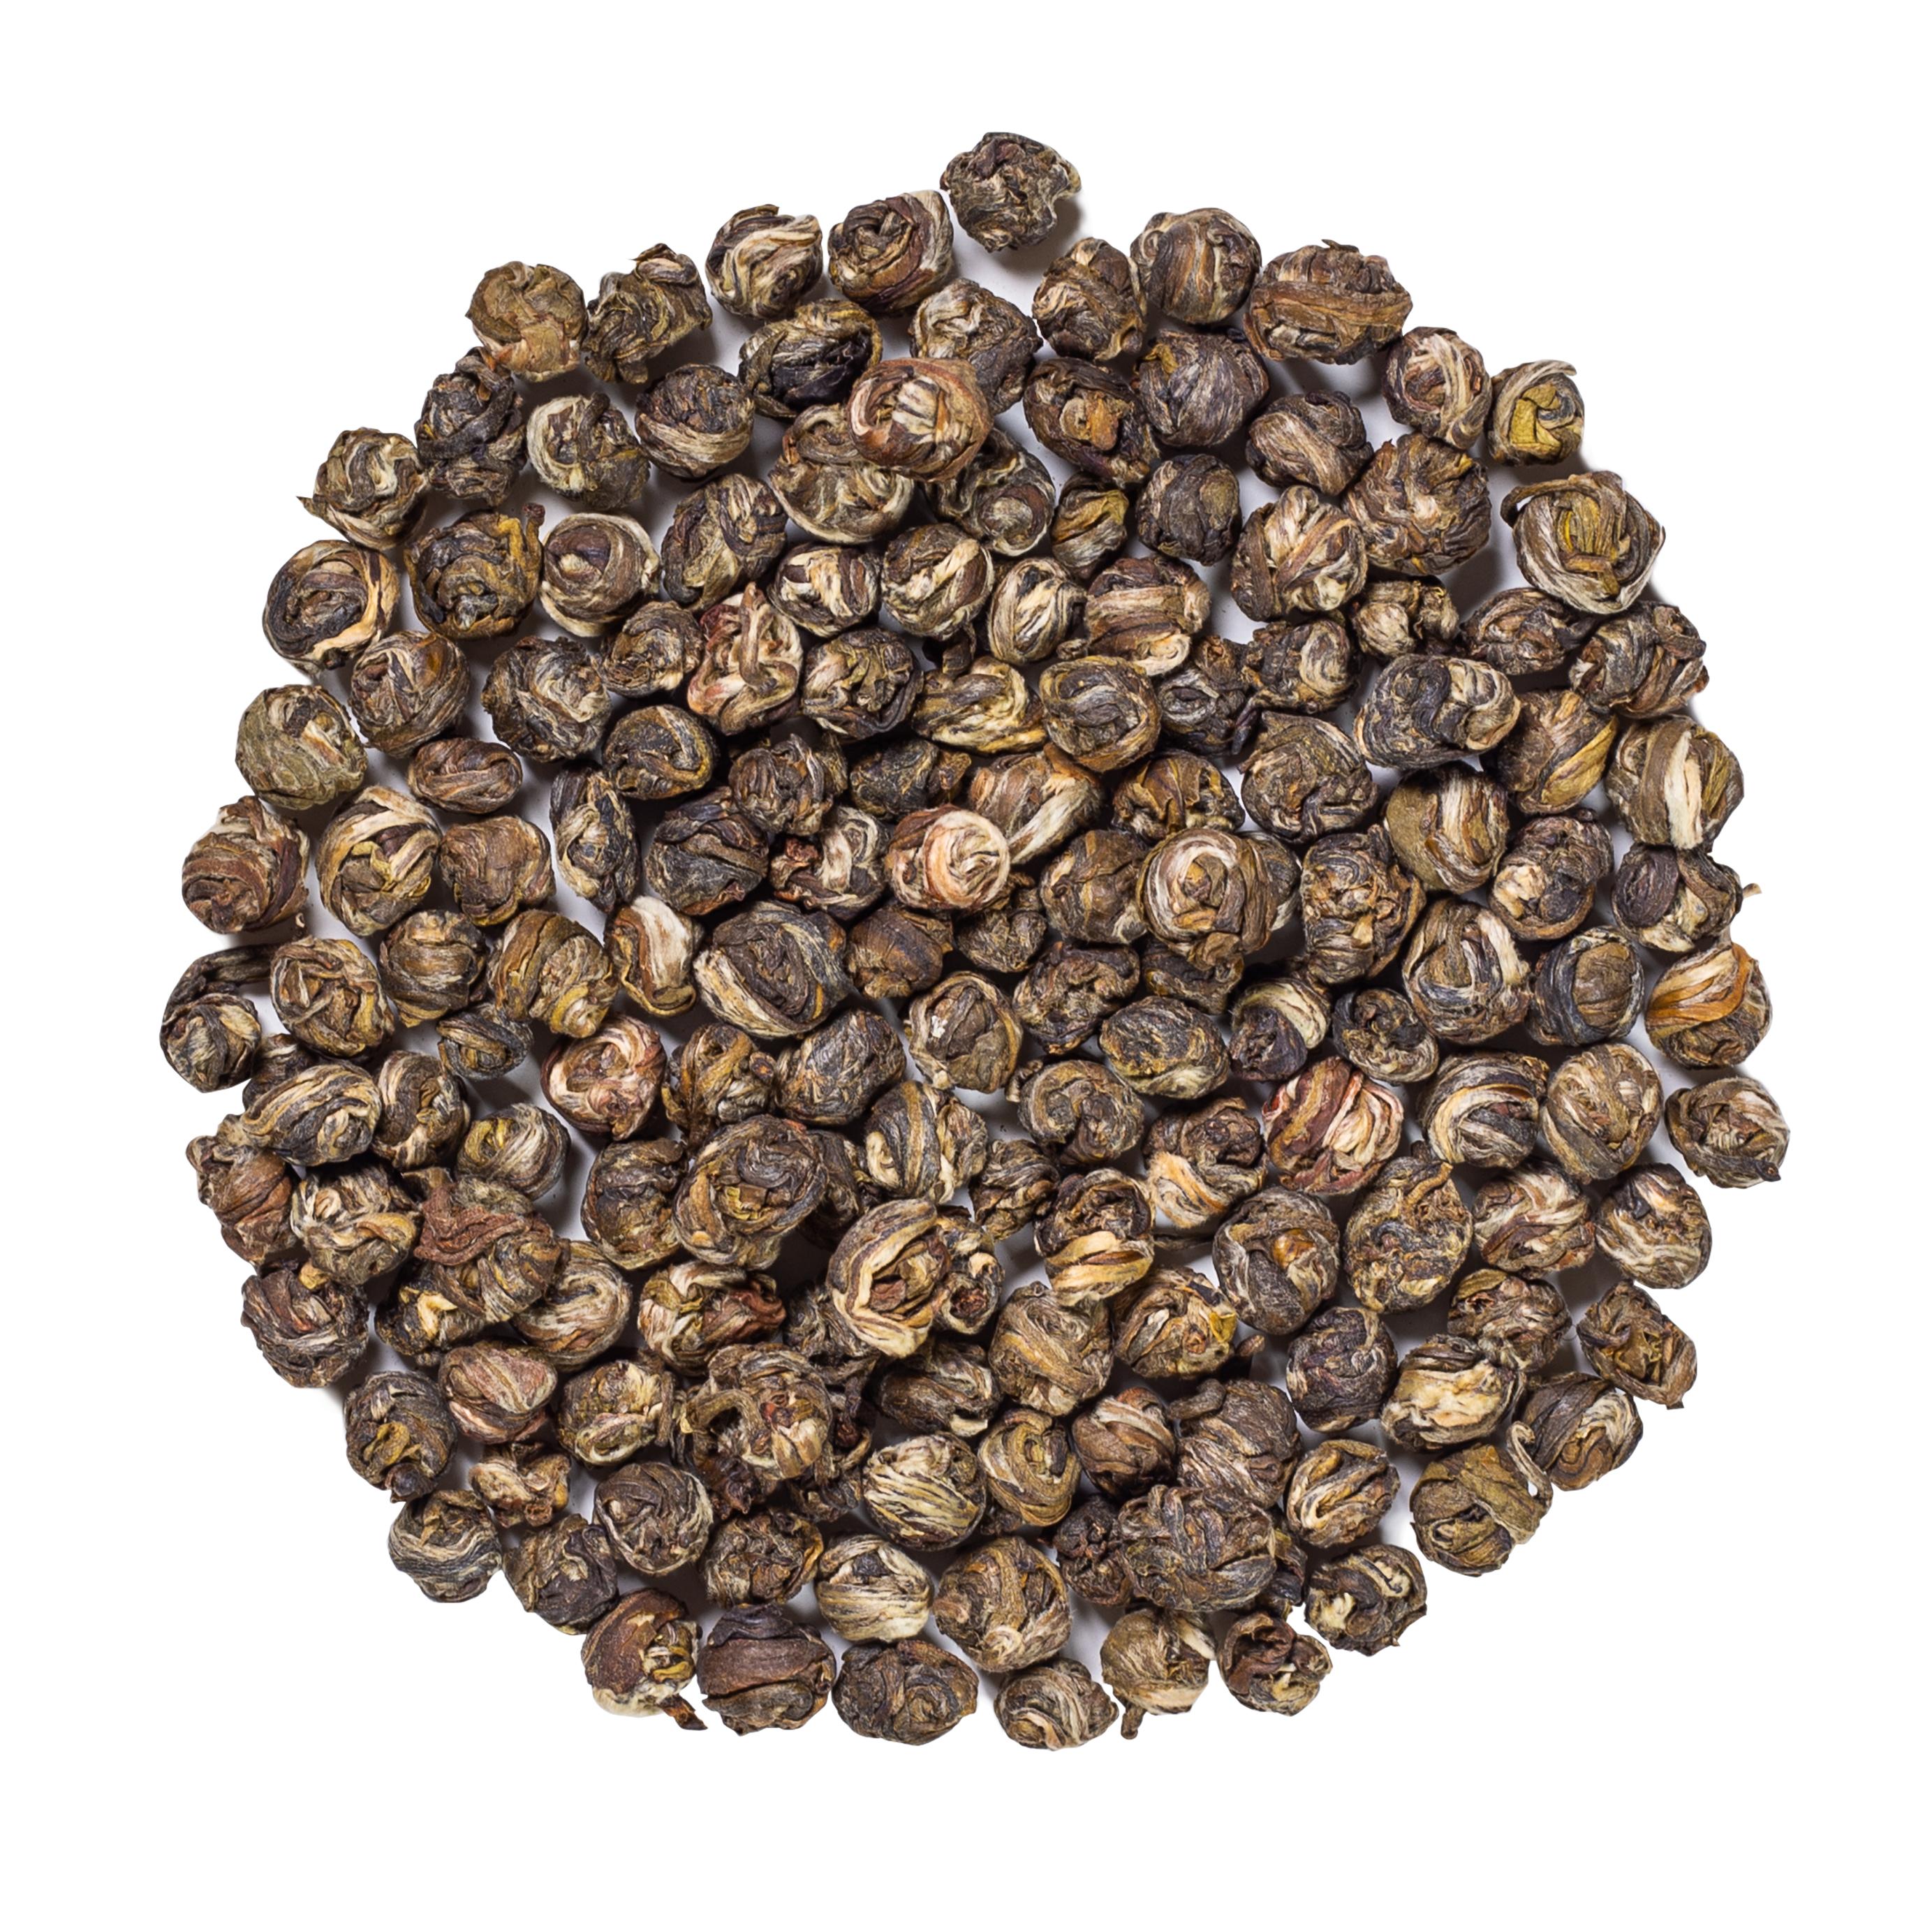 KUSMI TEA Perles de Jade au Jasmin bio - Thé vert de Chine, Jasmin - Thé en vrac - Kusmi Tea